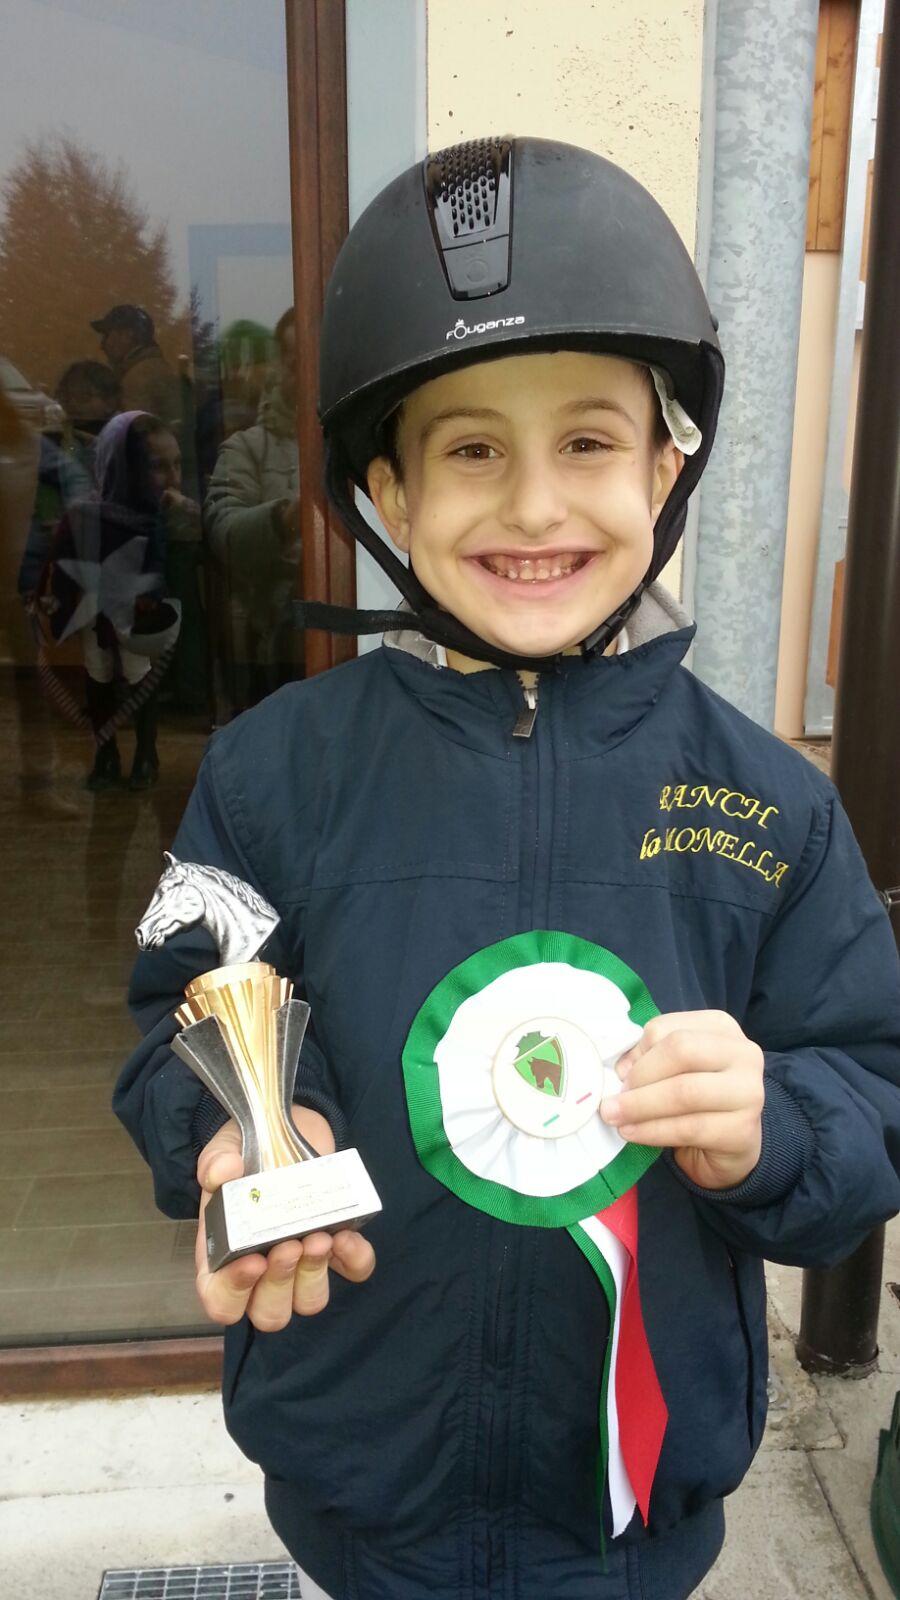 Campionati Italiani Sef 2016, Gimkana Pony e Agility Pony e Cavalli